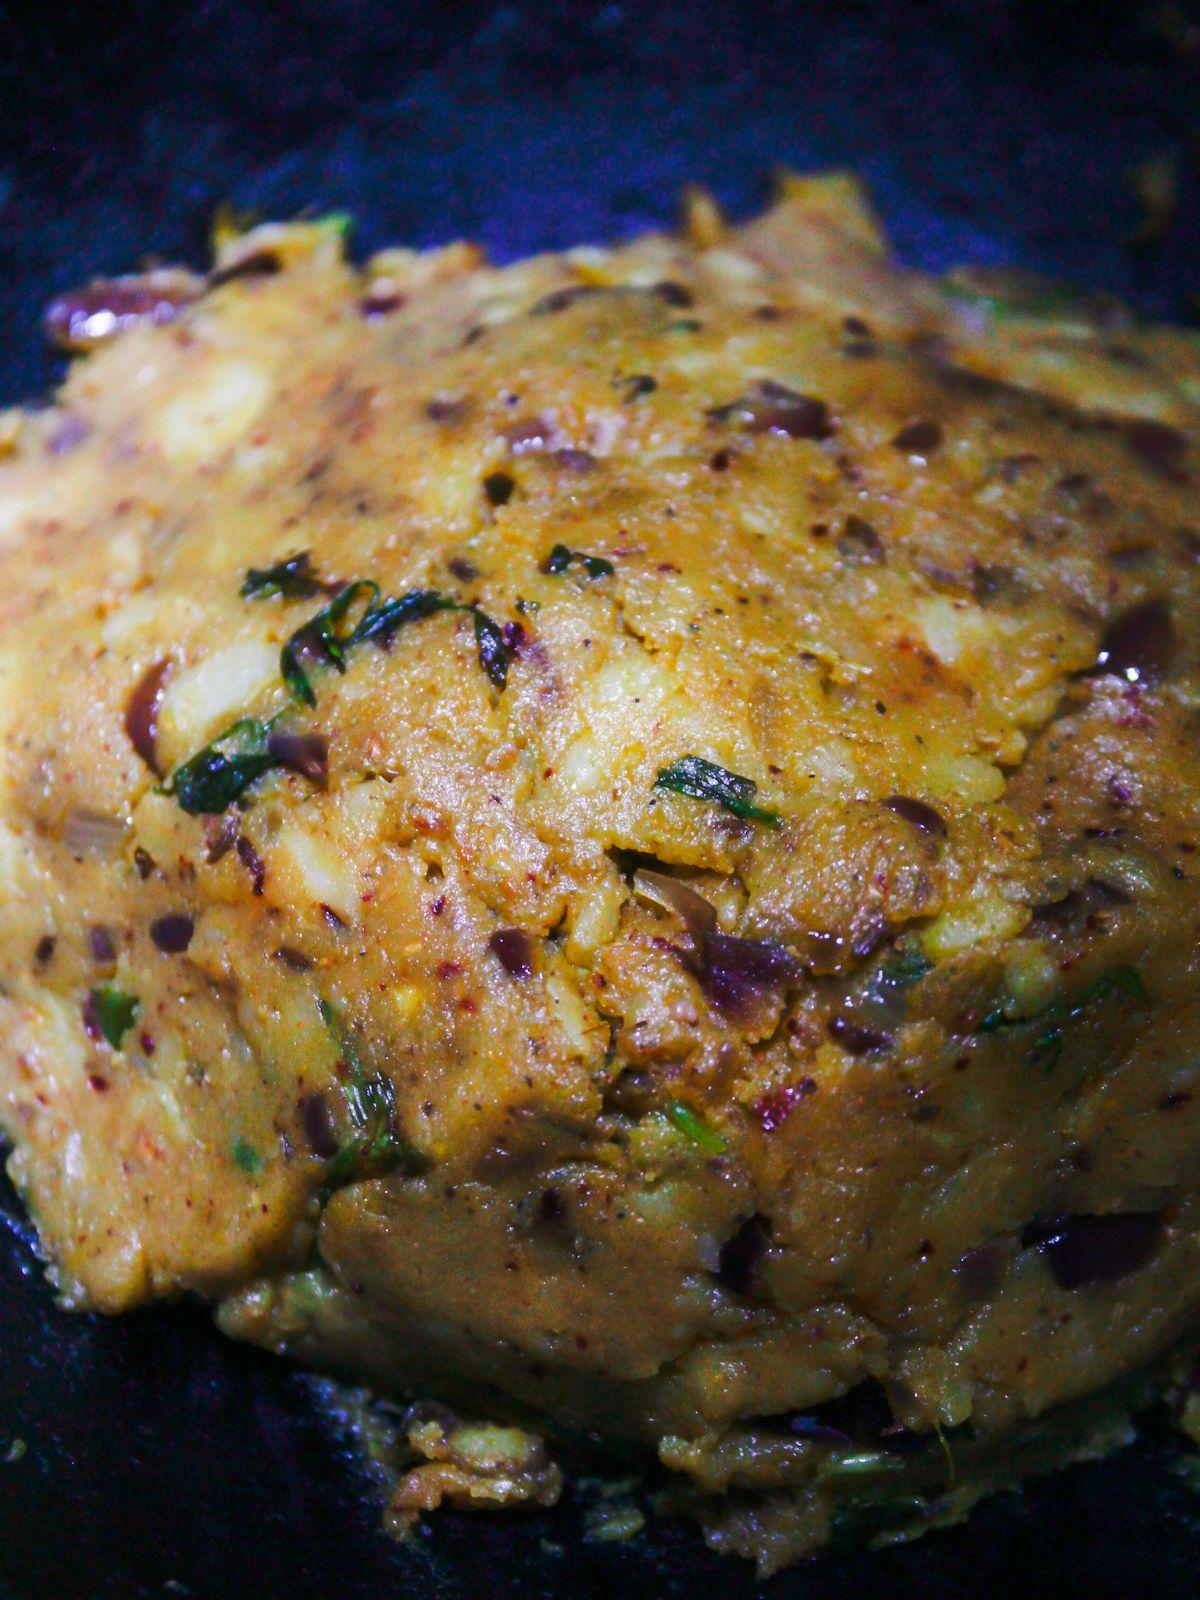 Seasoned mashed potatoes browning in skillet